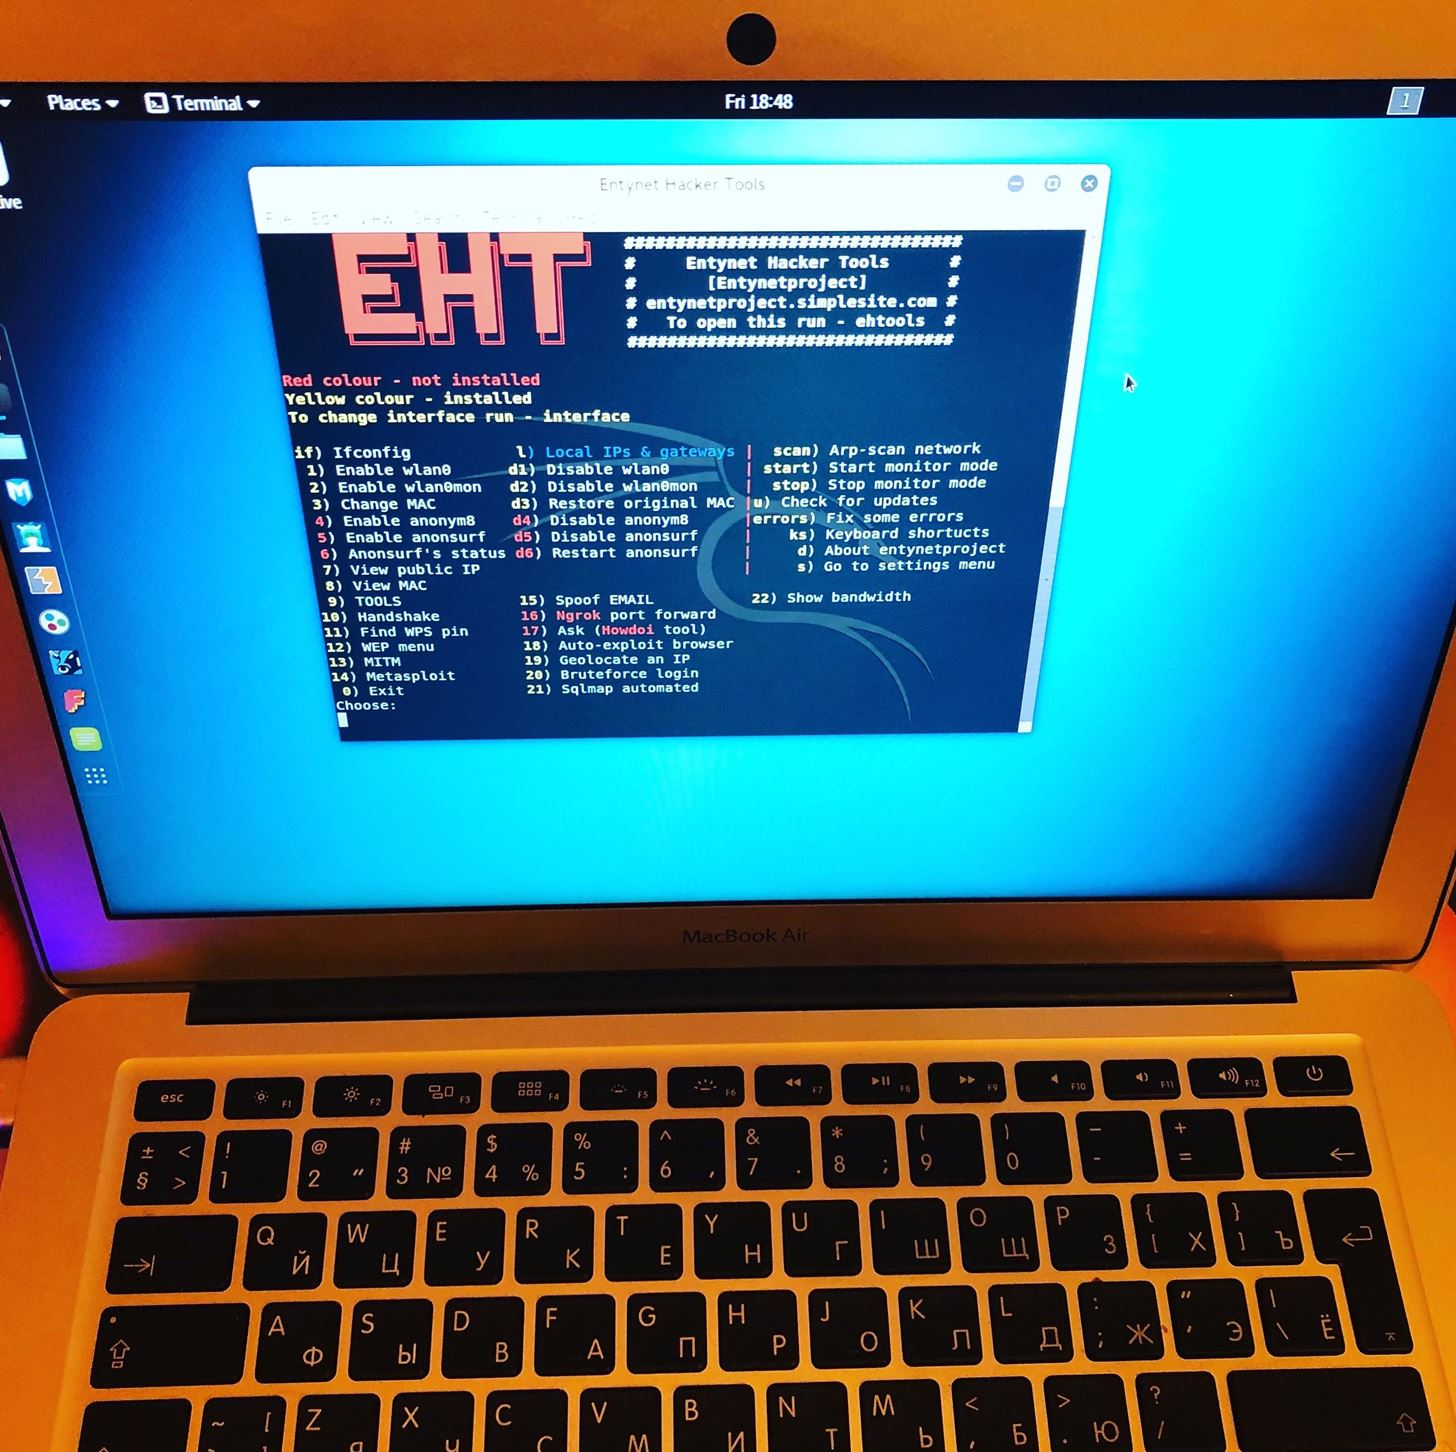 Ehtools Framework by Entynetproject